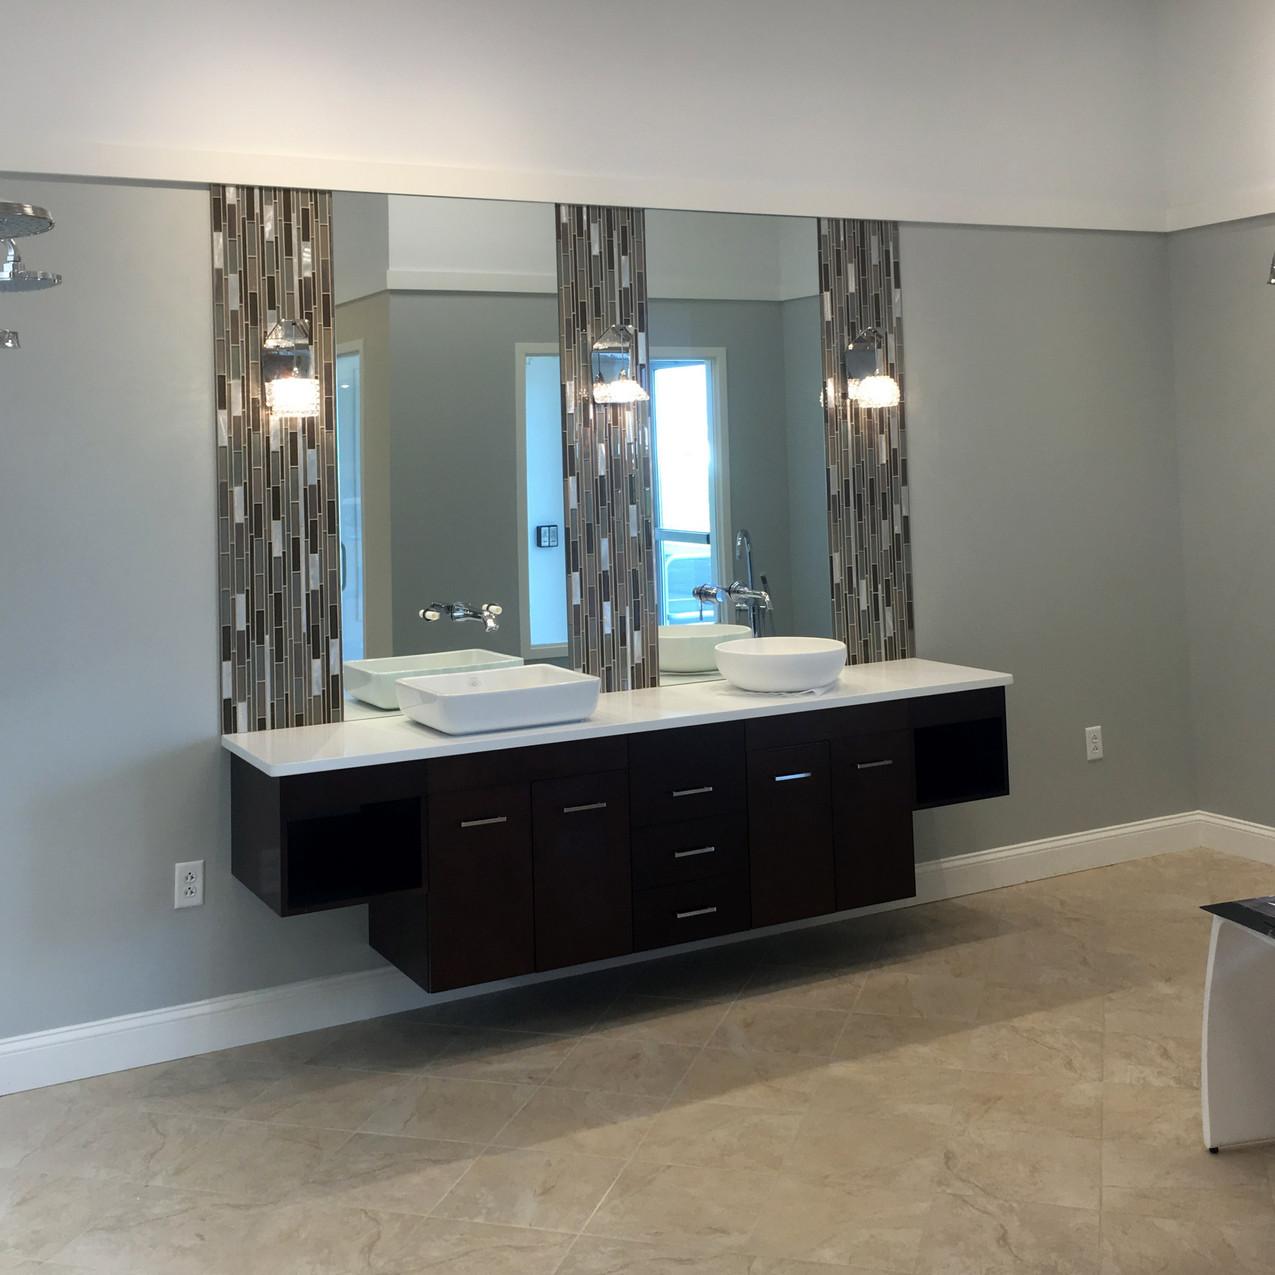 Bath display